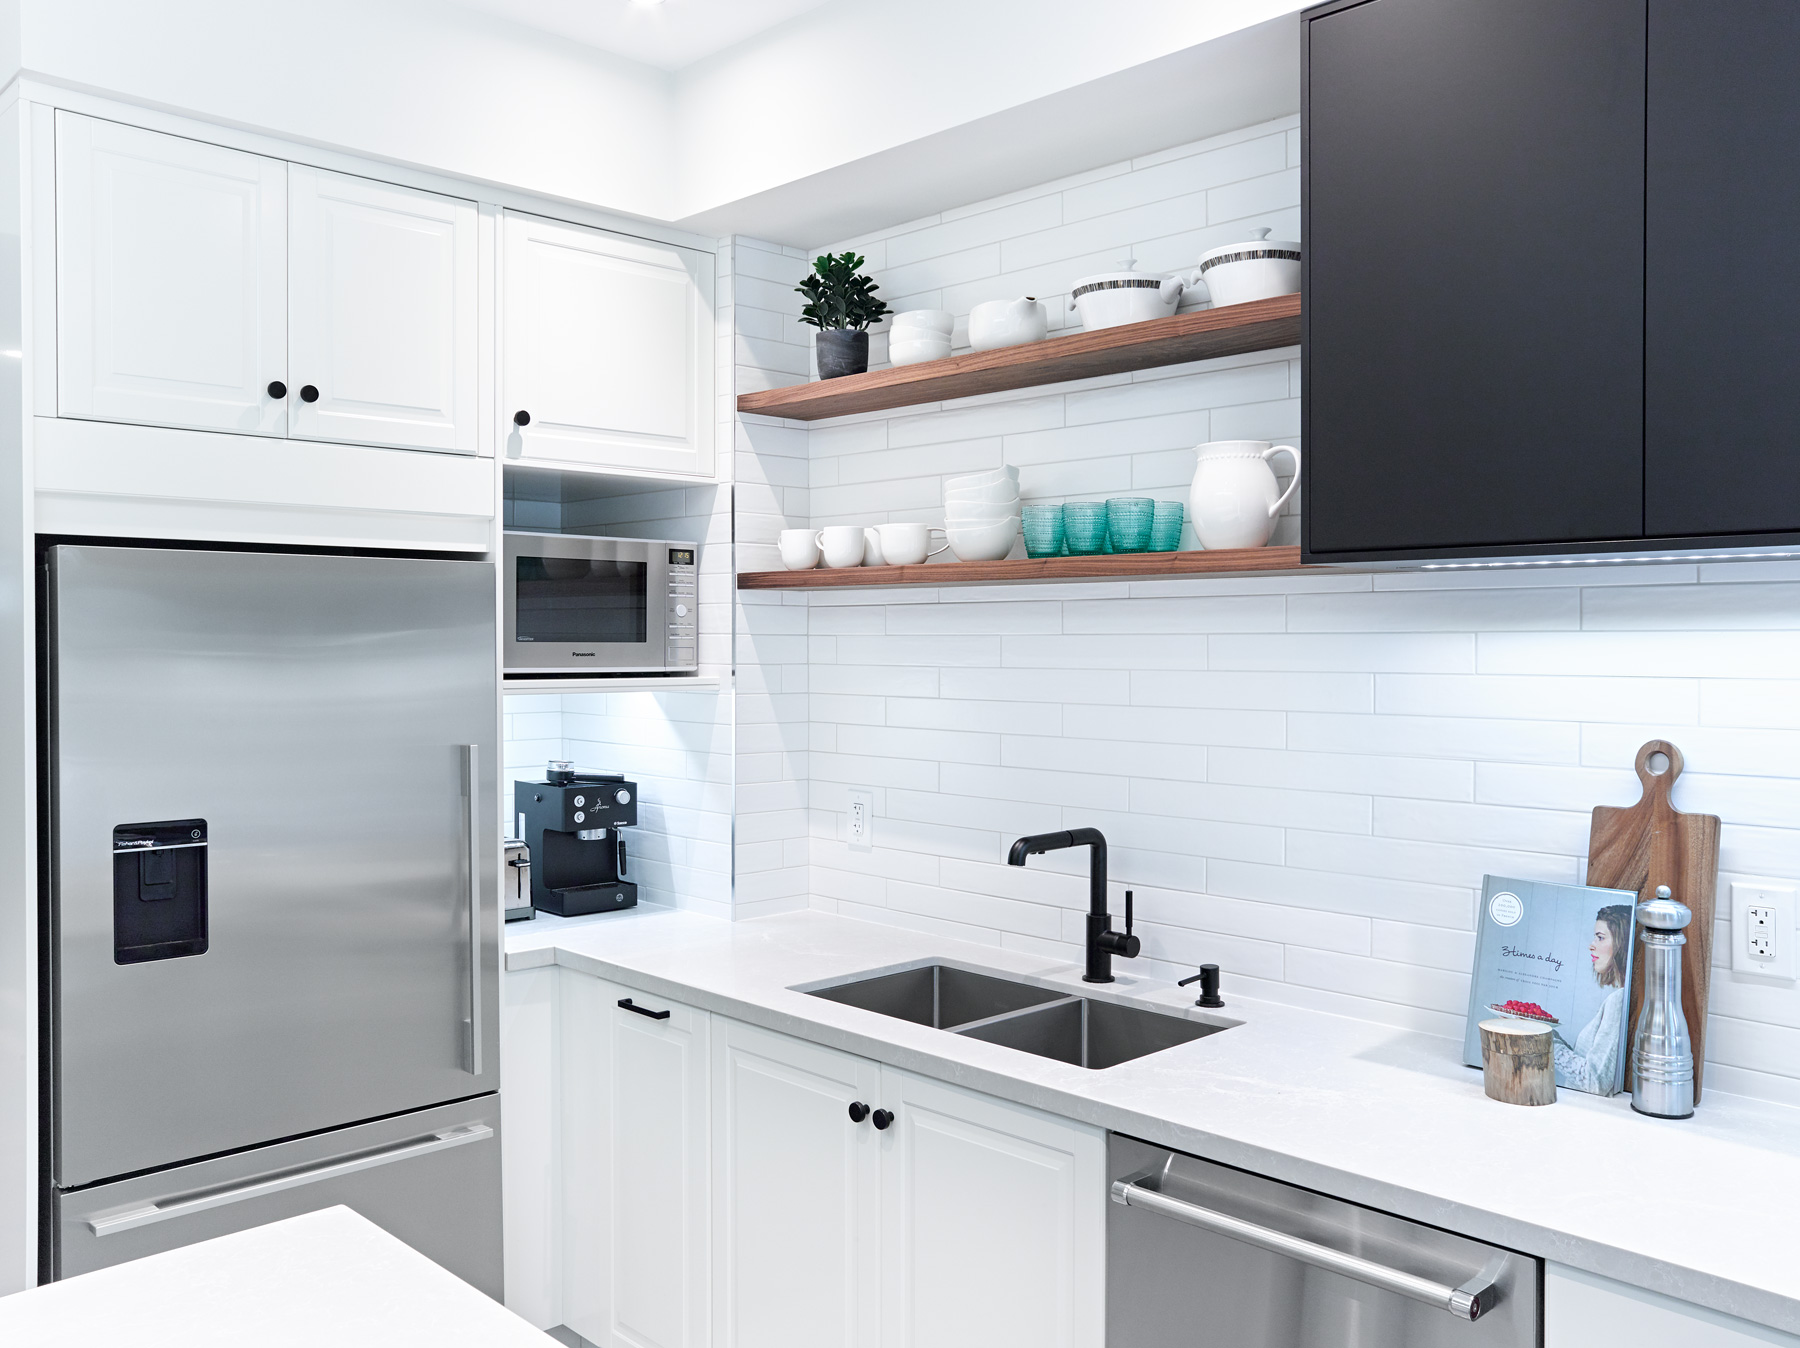 White Ikea Kitchen with Wood Shelves